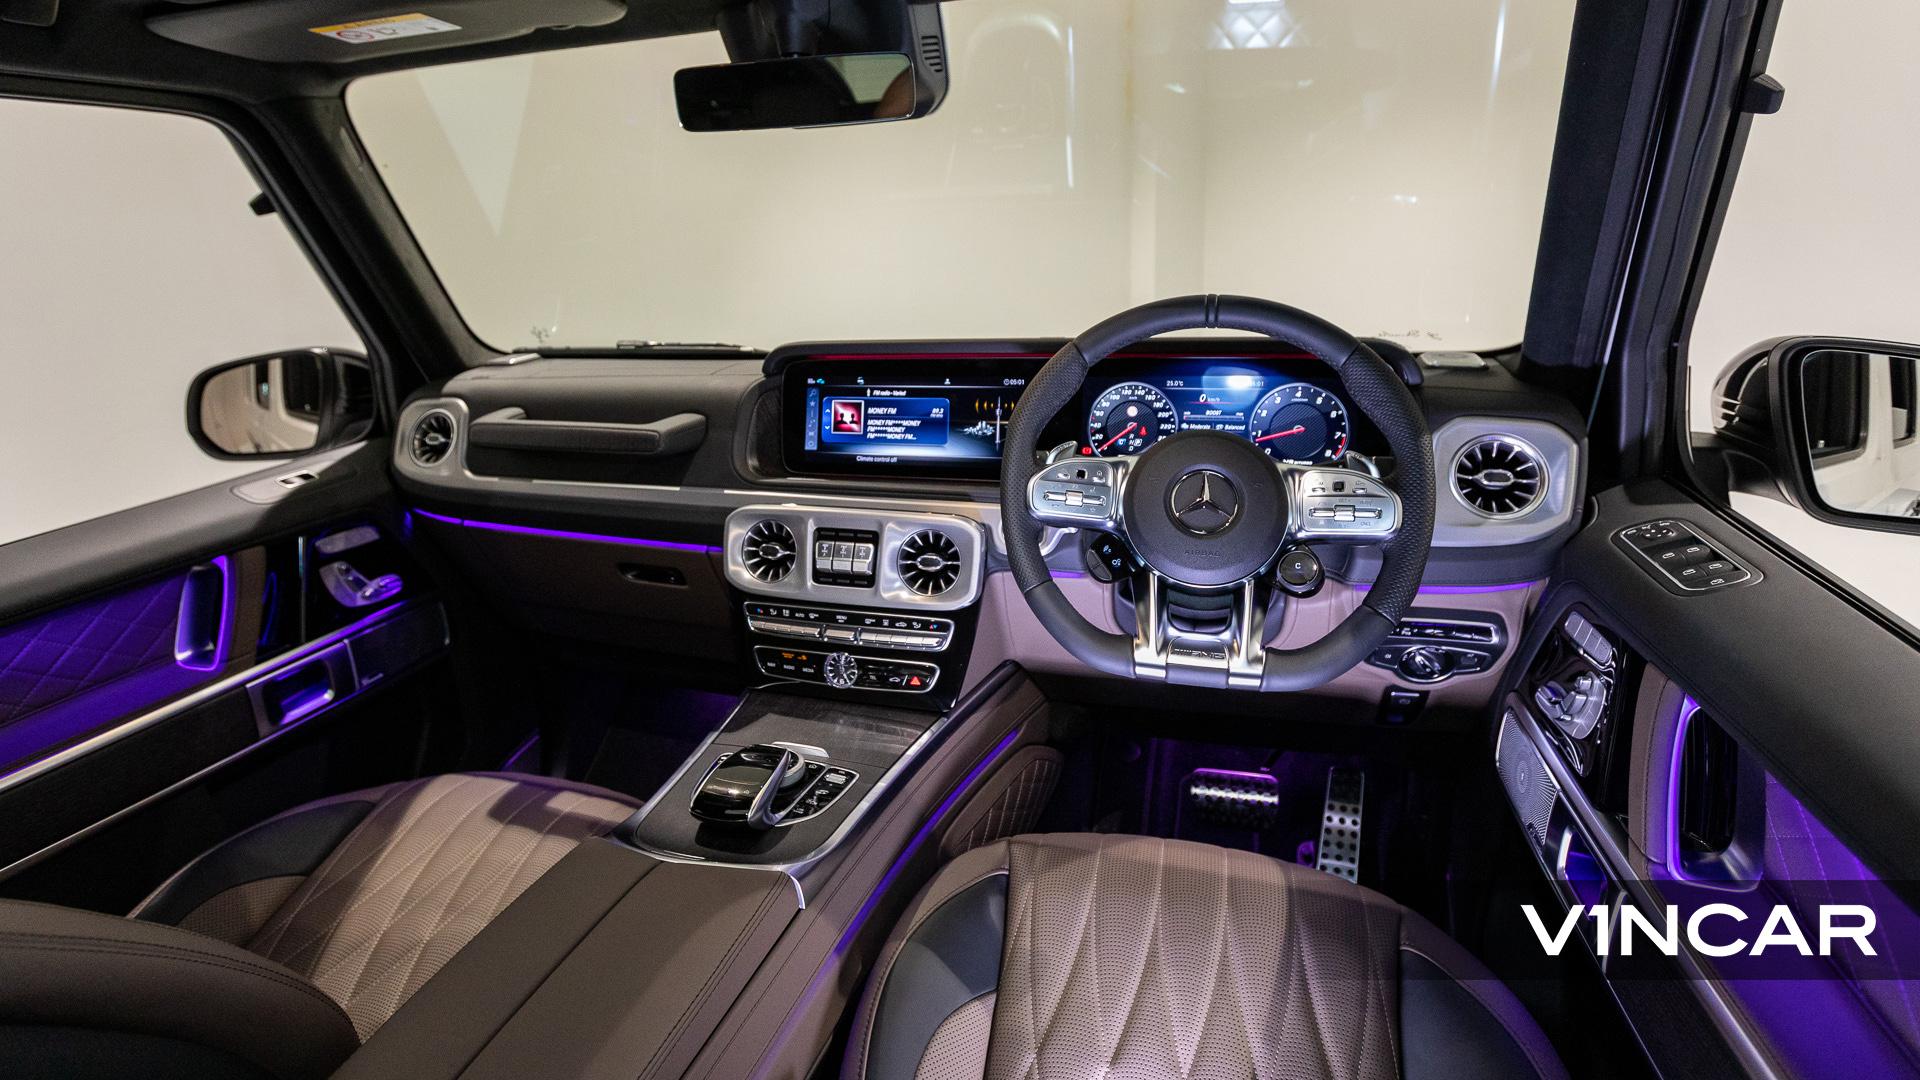 Mercedes-AMG G63 - Interior Dashboard